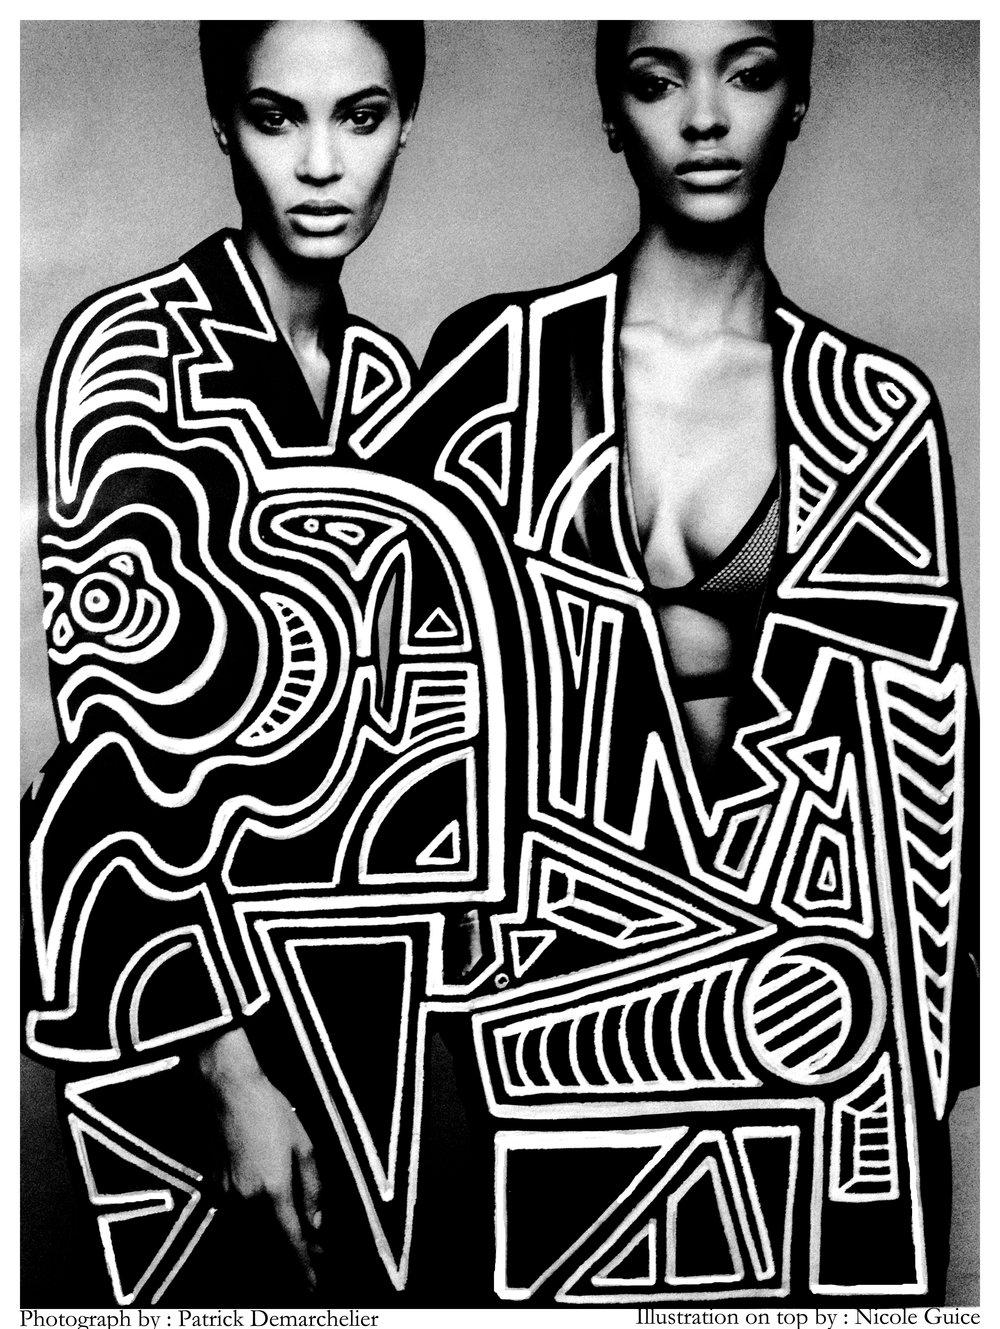 Joan Smalls and Jourdan Dunn W magazine editorial 2014_Illograph.jpg